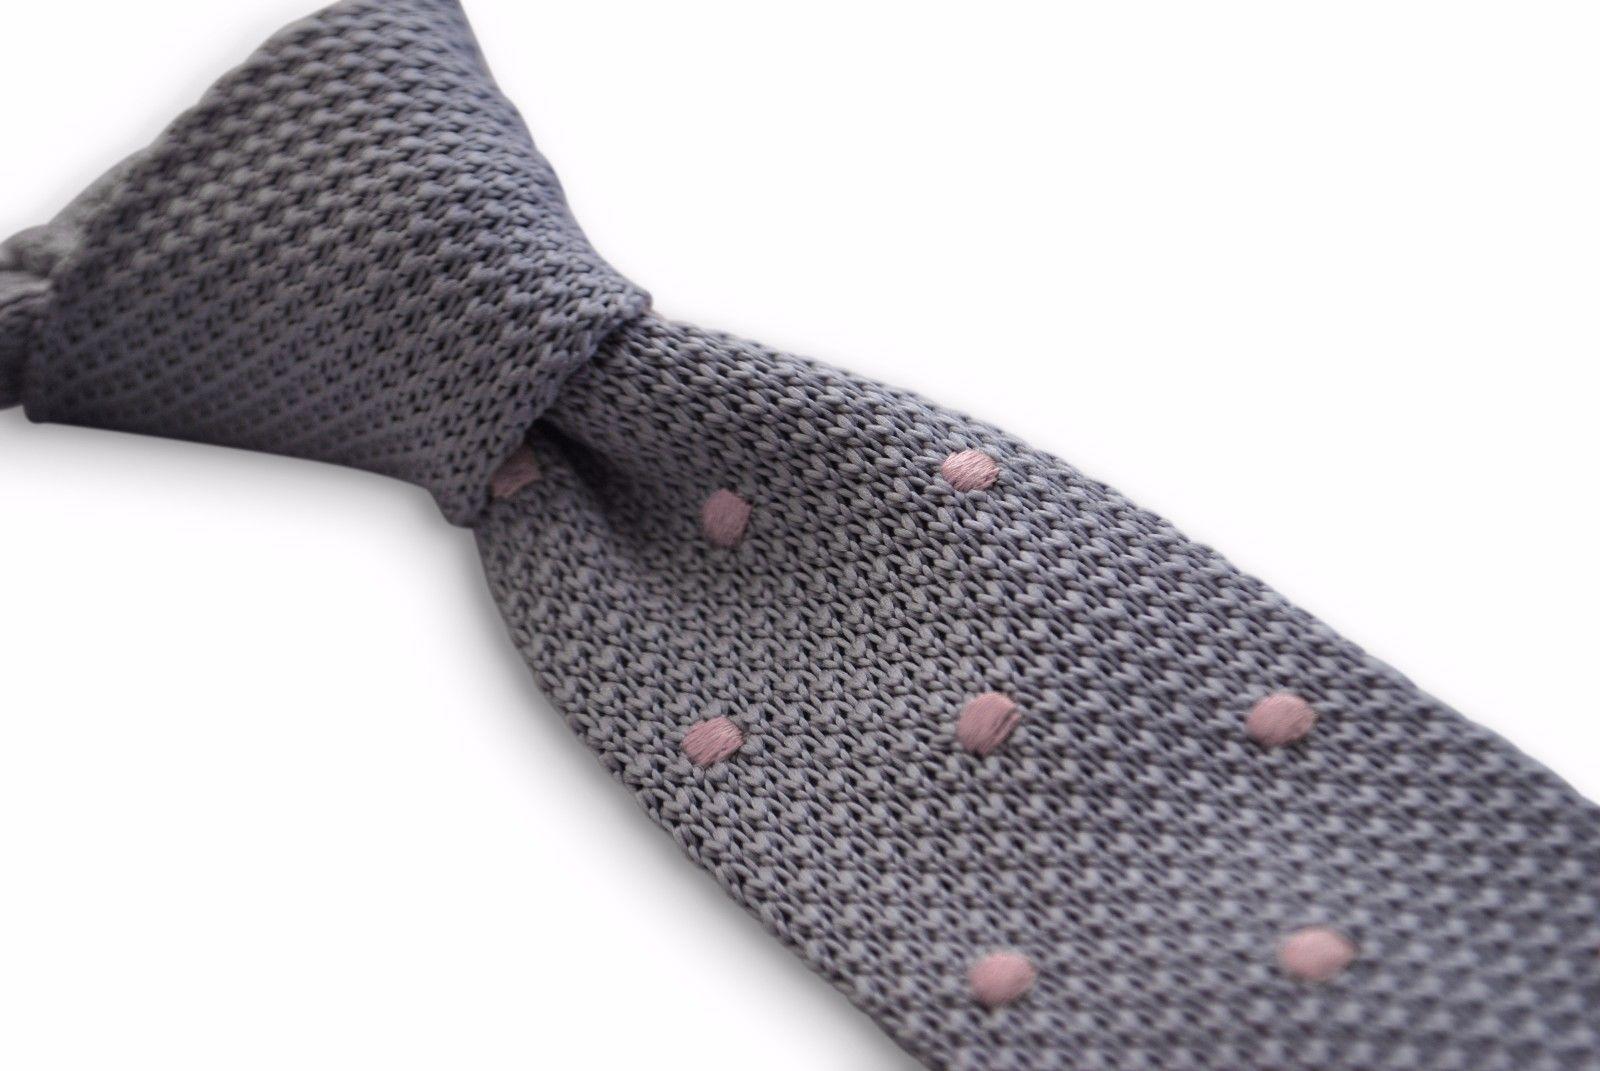 Frederick Thomas grigio e rosa a pois, da uomo maglia cravatta ft3298